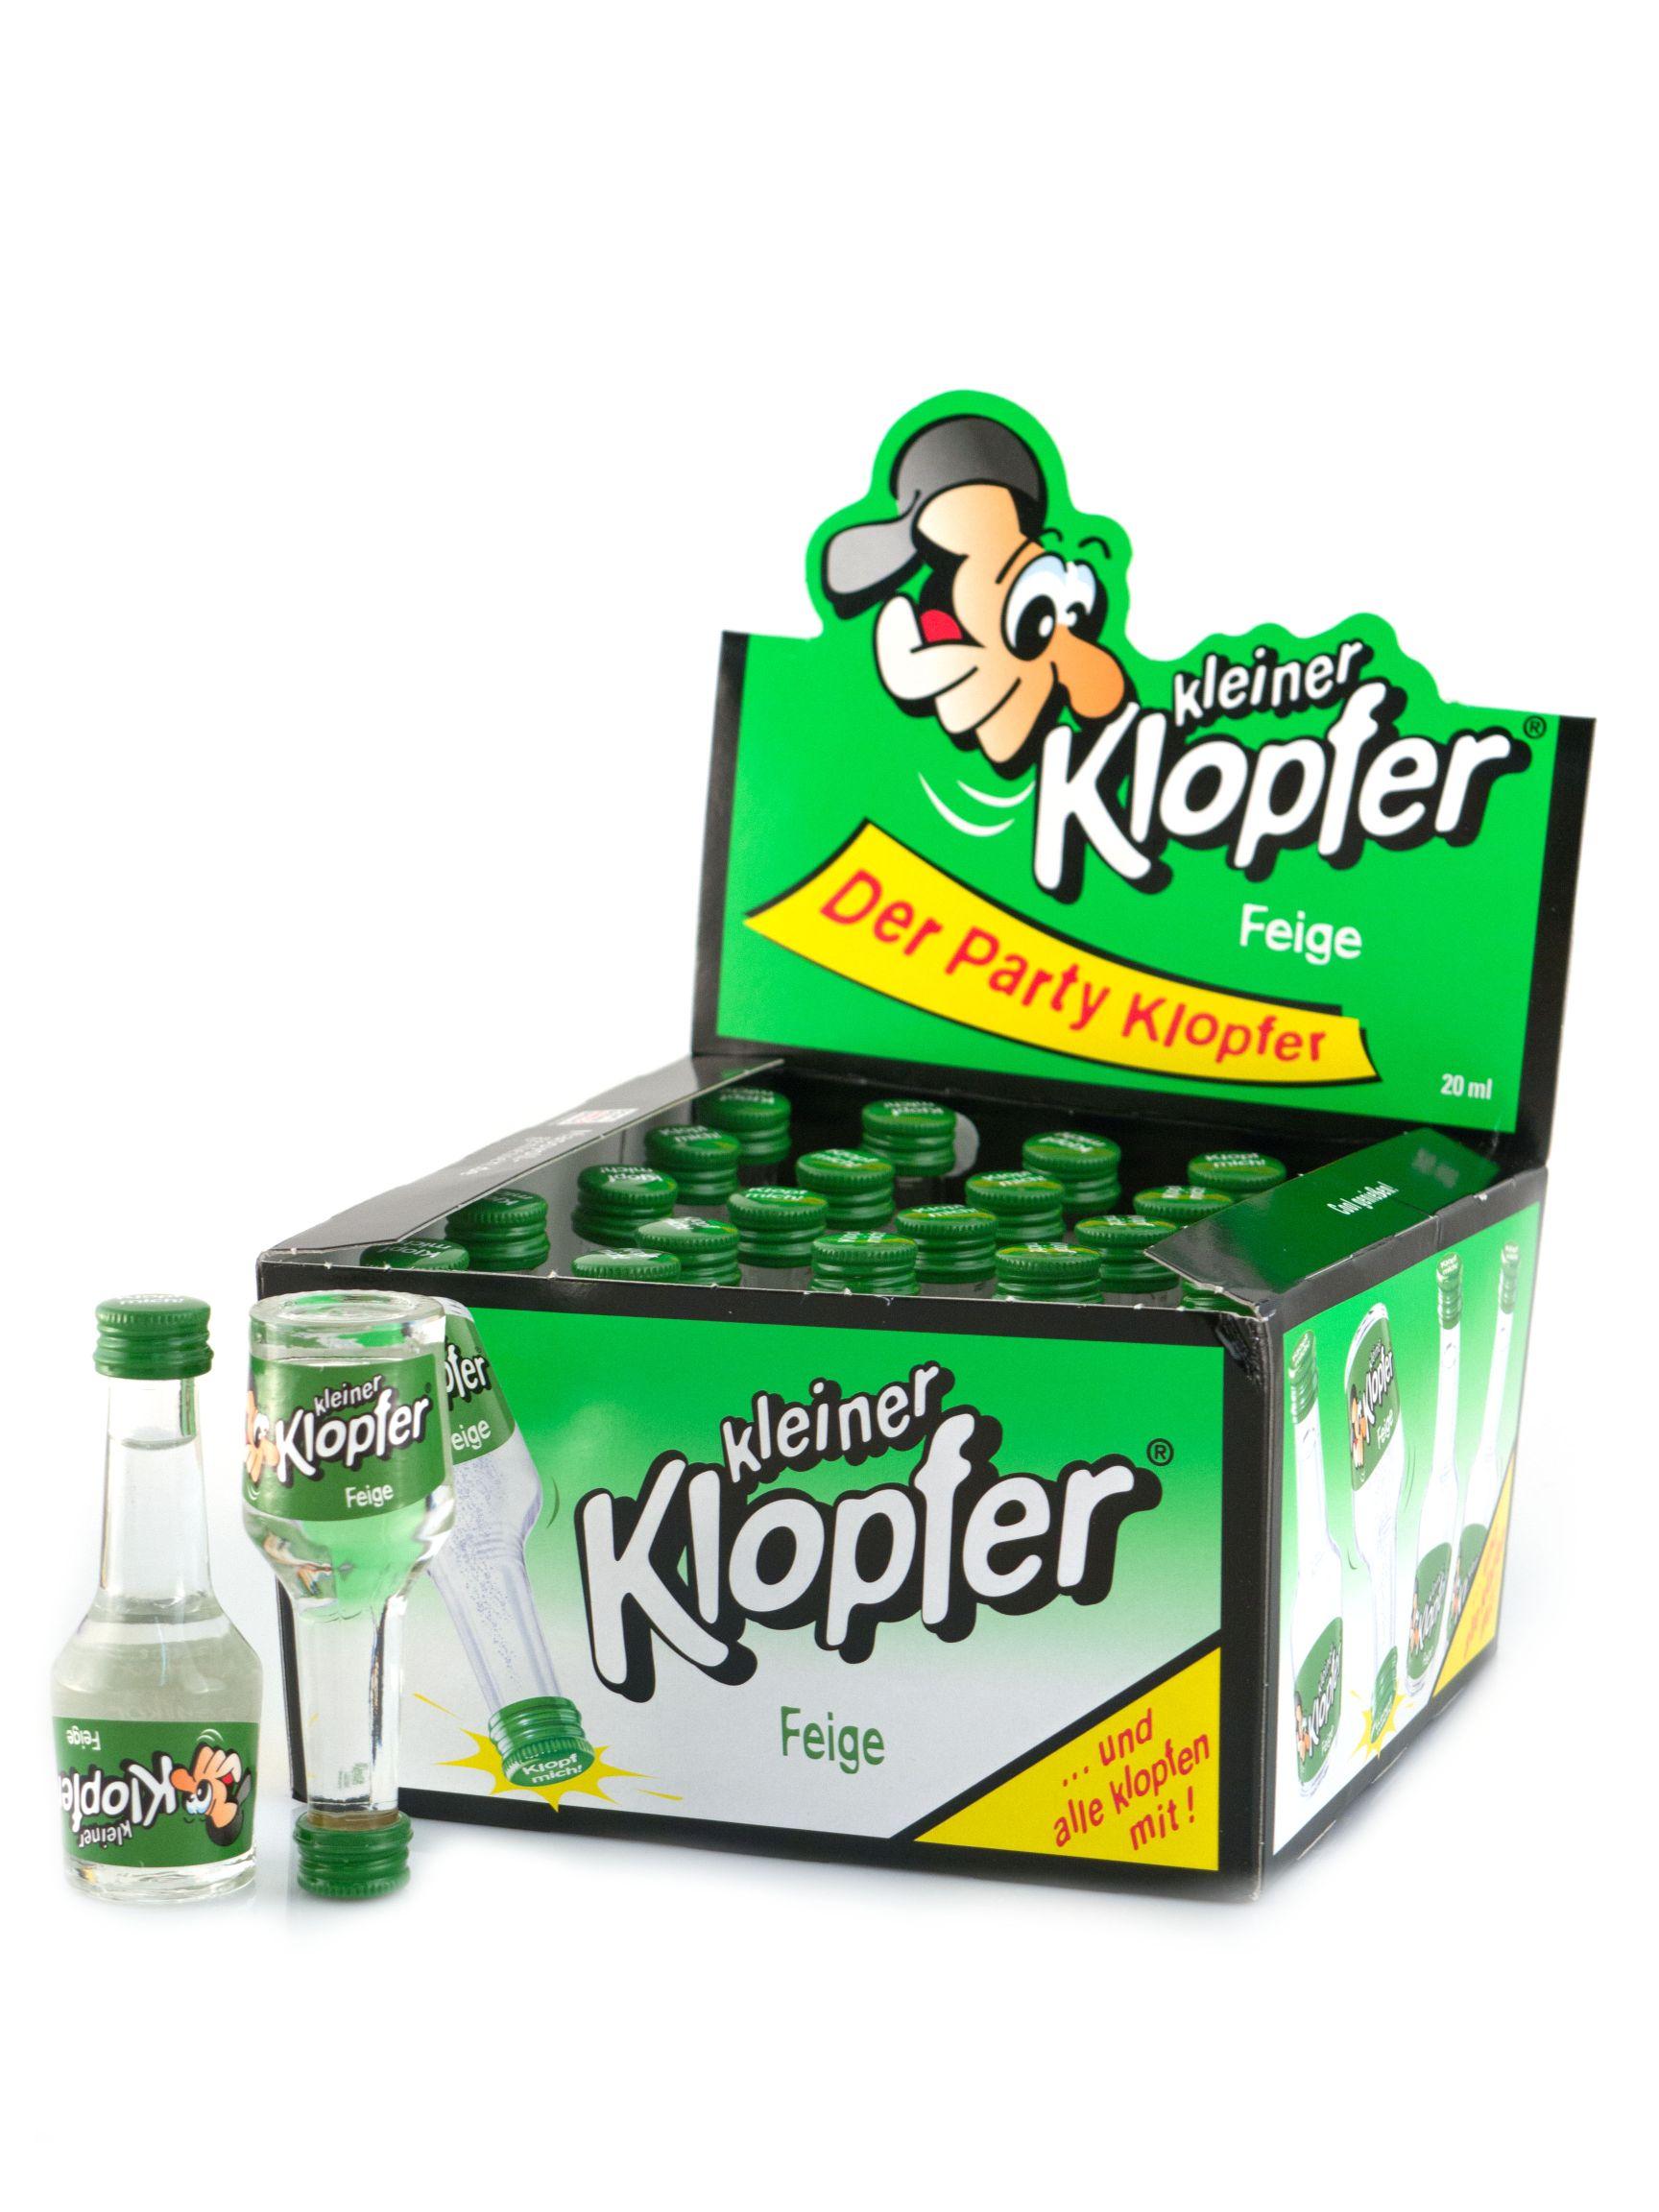 Alkohol Sorten Klopfer While your plumber